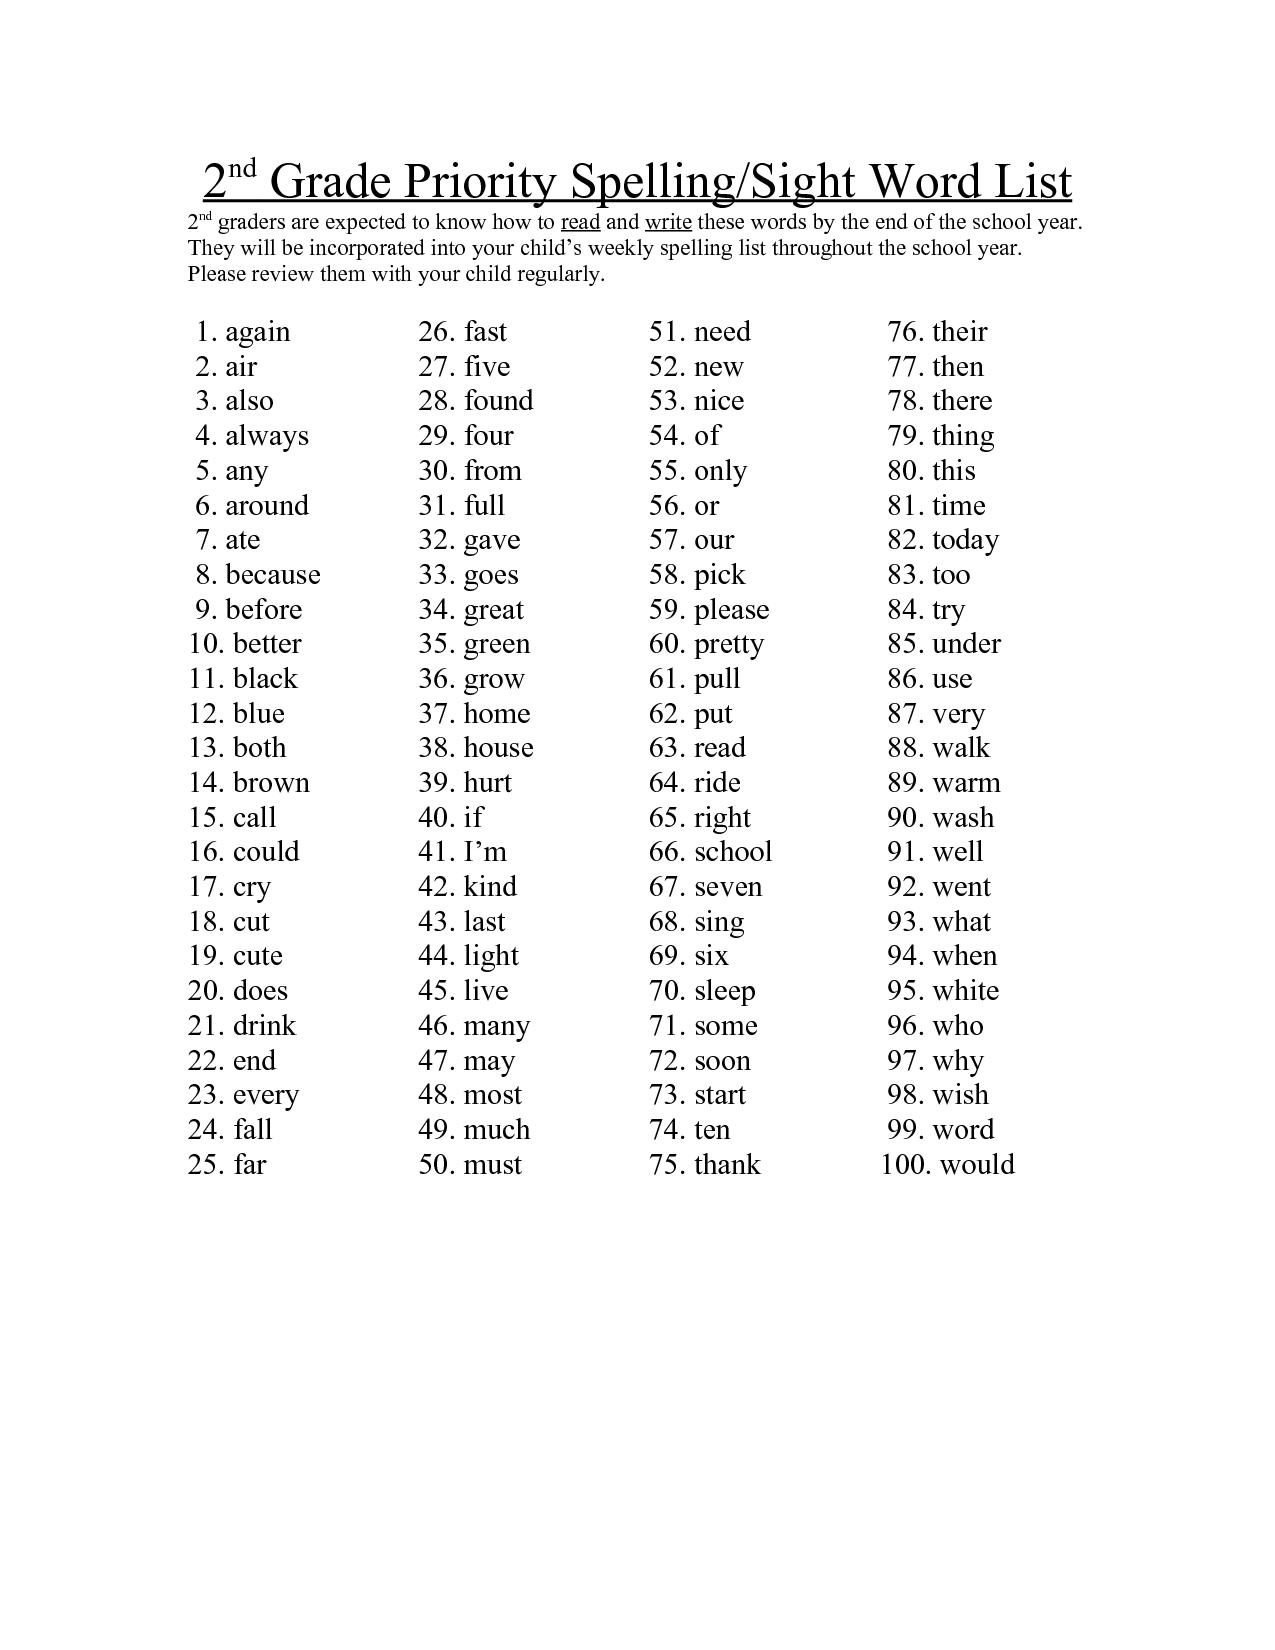 2nd Grade Sight Word List Printable